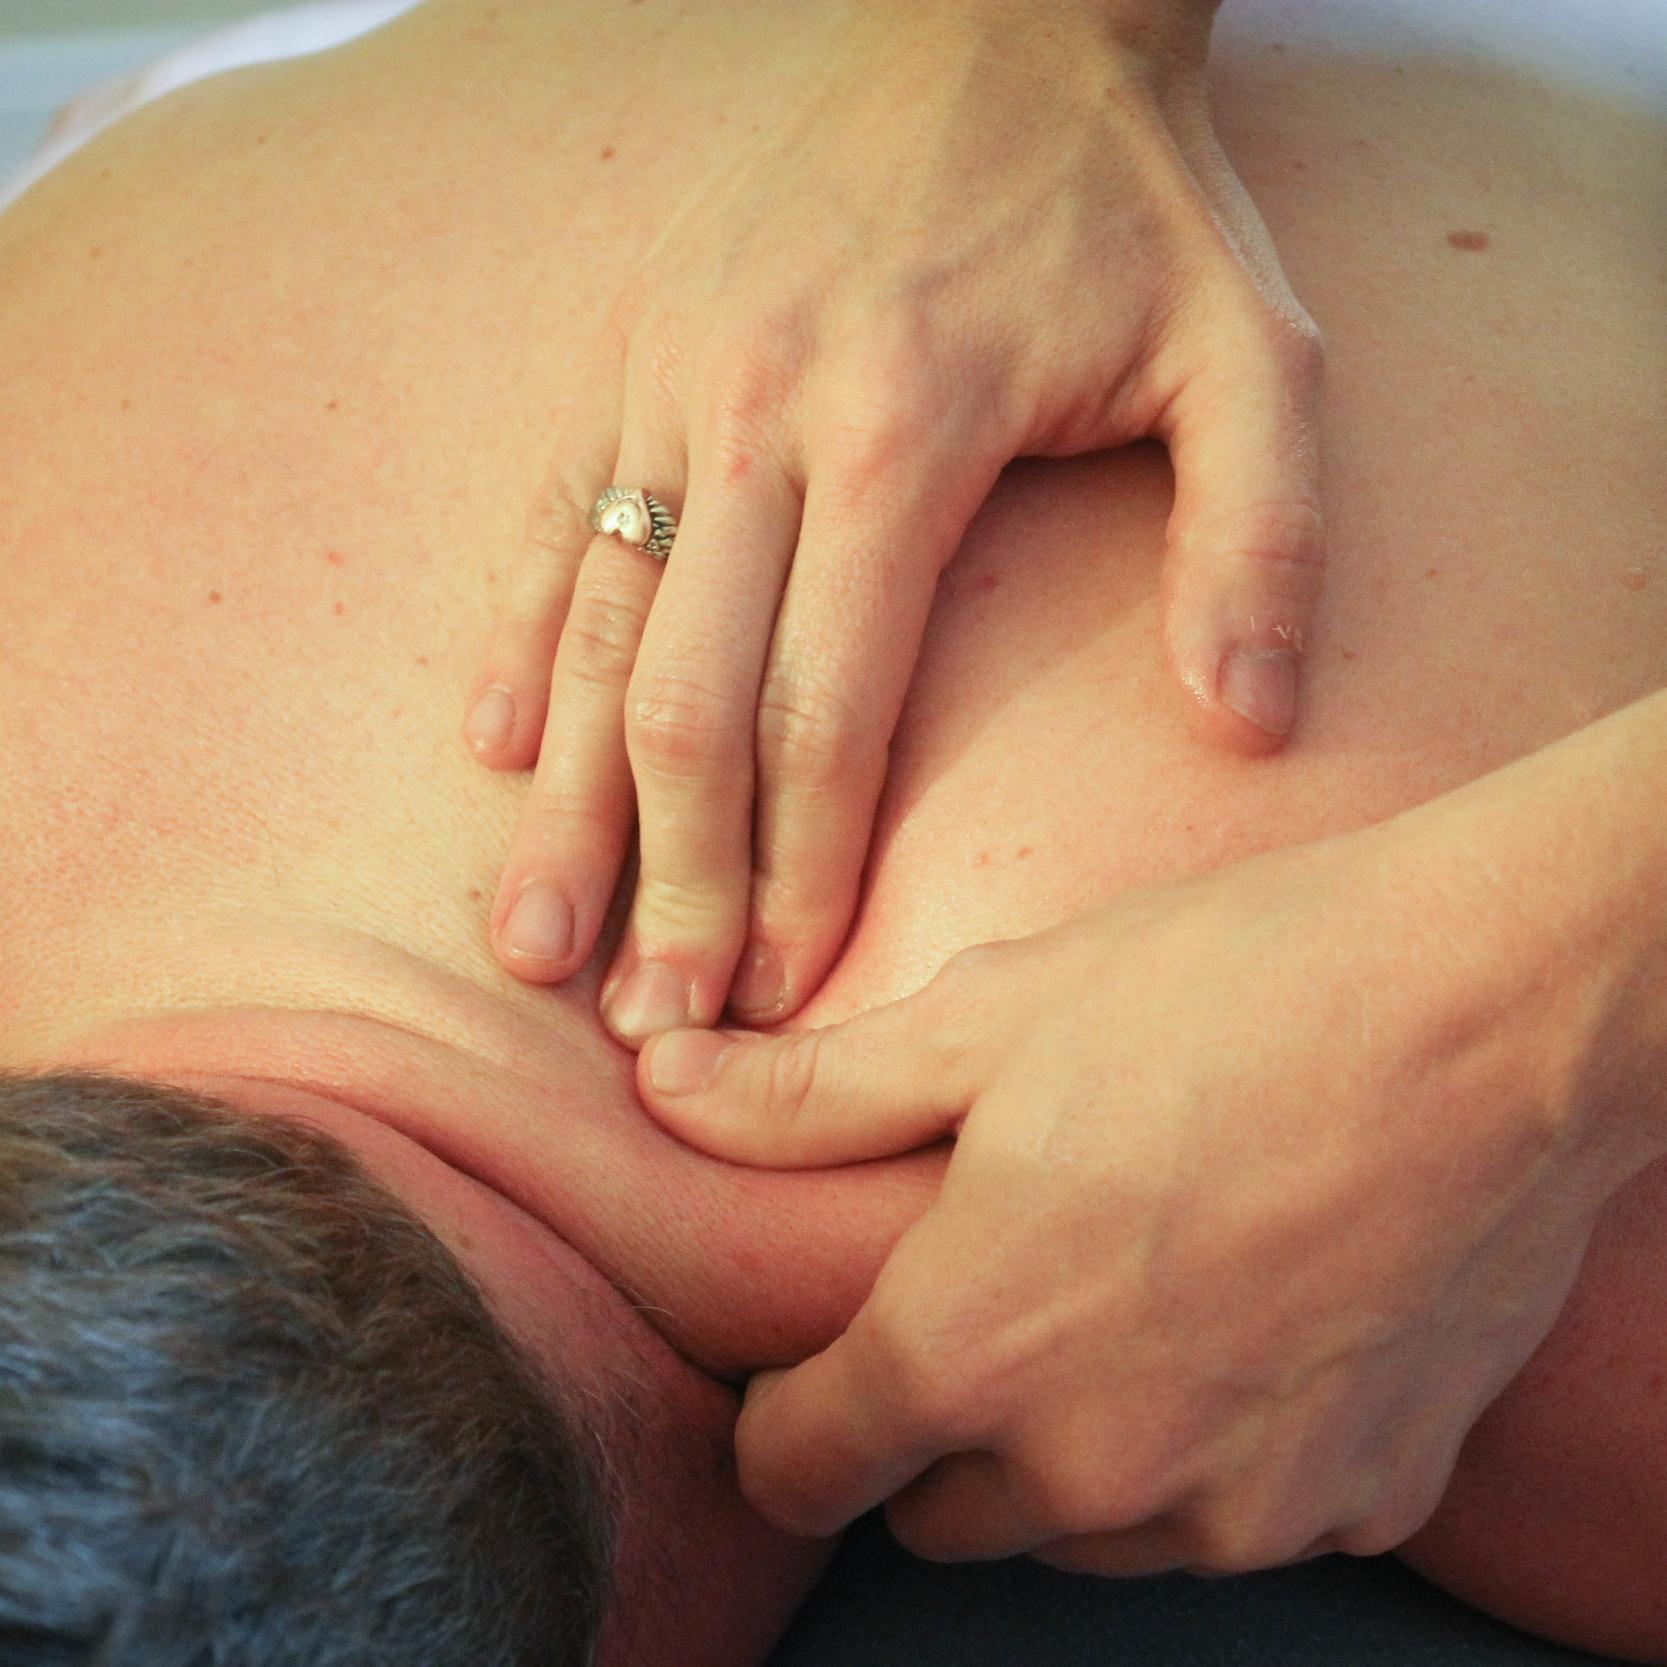 2015.08 KM in studio massage shoot (36 of 81).jpg